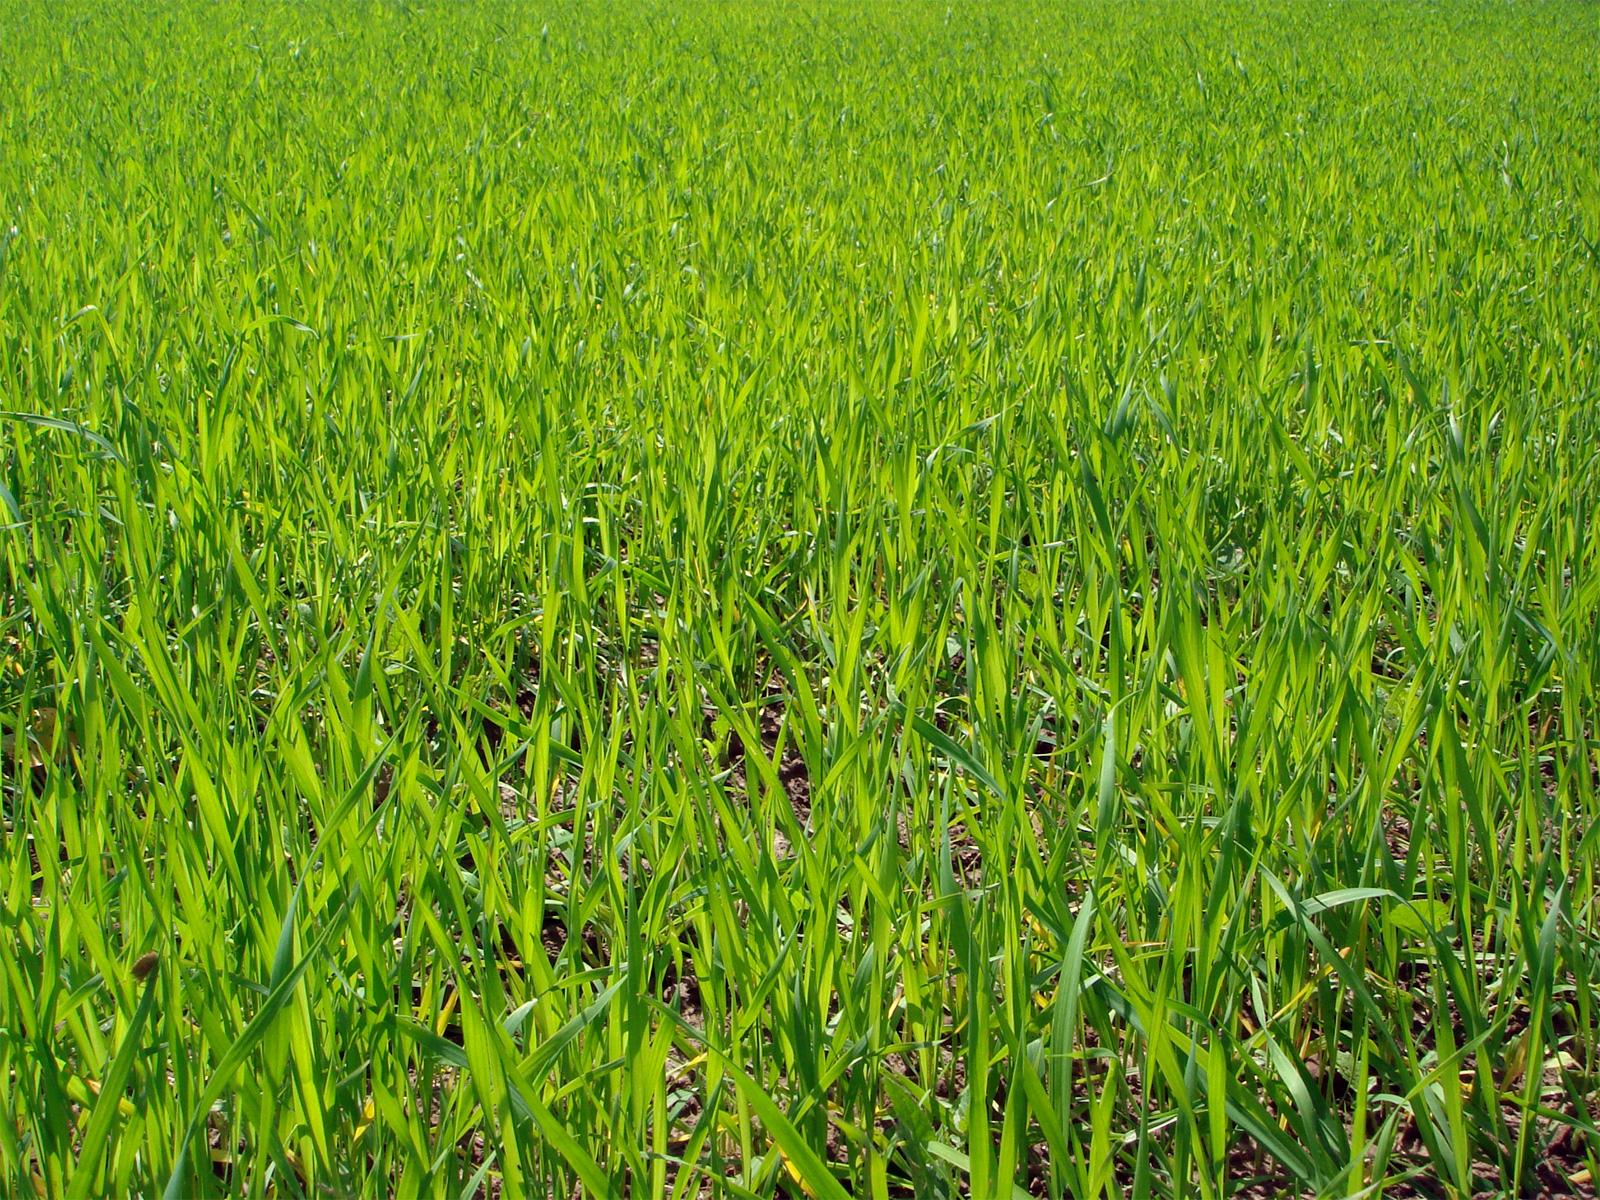 File:Grass (field in Kstovsky District).jpg - Wikimedia Commons